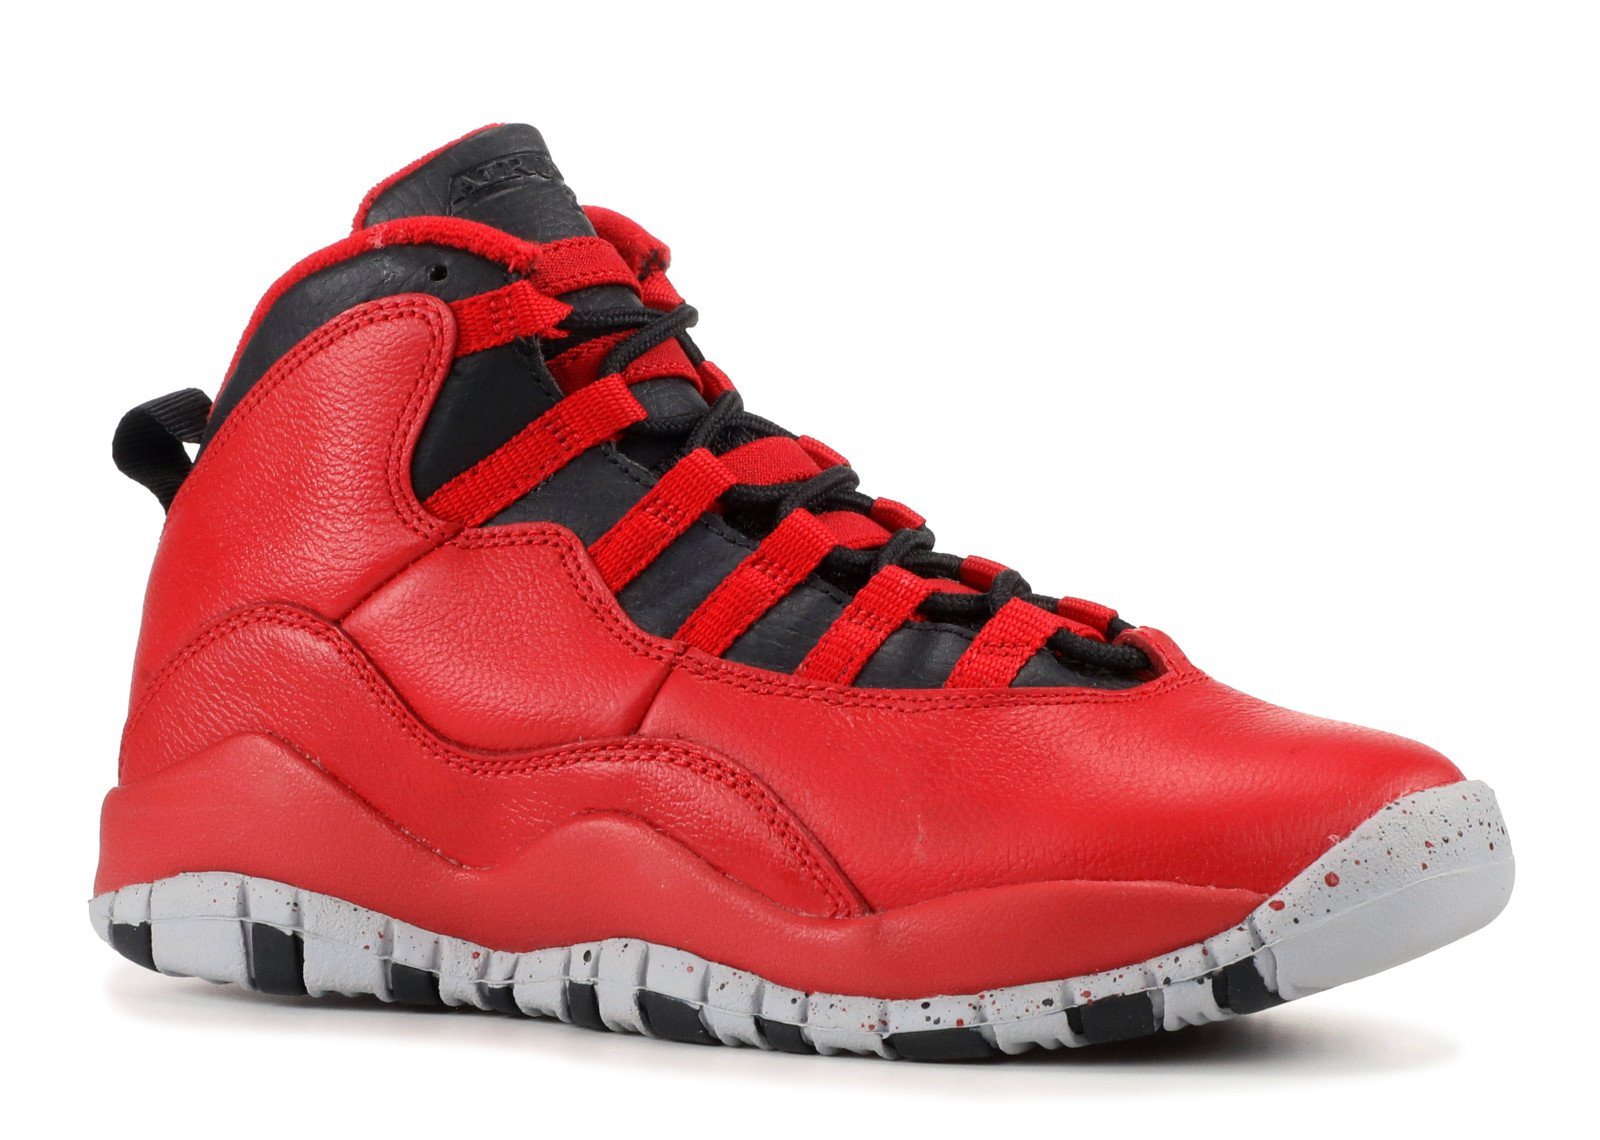 Jordan Air 10 Retro 30th BG Bulls Over Broadway Big Kids Shoes Gym Red/Black-Wolf Grey 705179-601 (4 M US) by Jordan